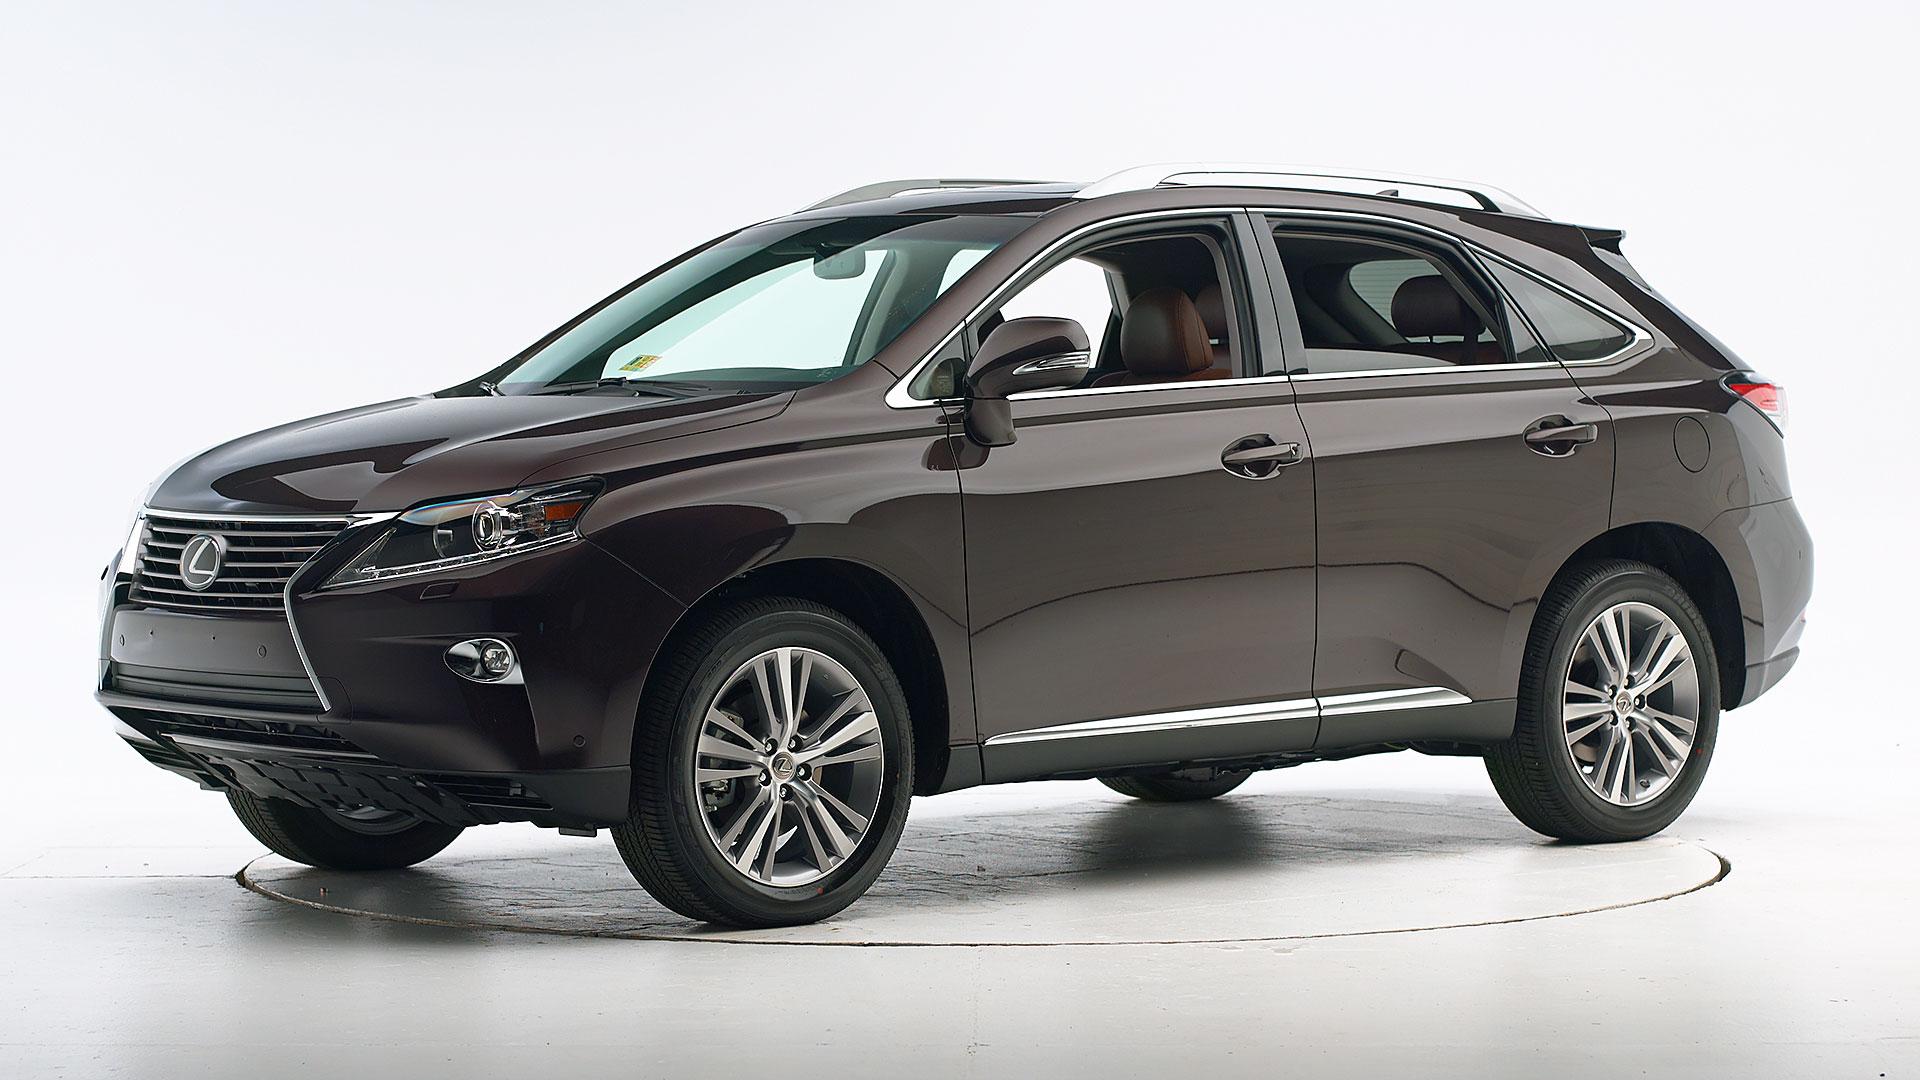 Lexus 2015 Suv >> 2015 Lexus Rx